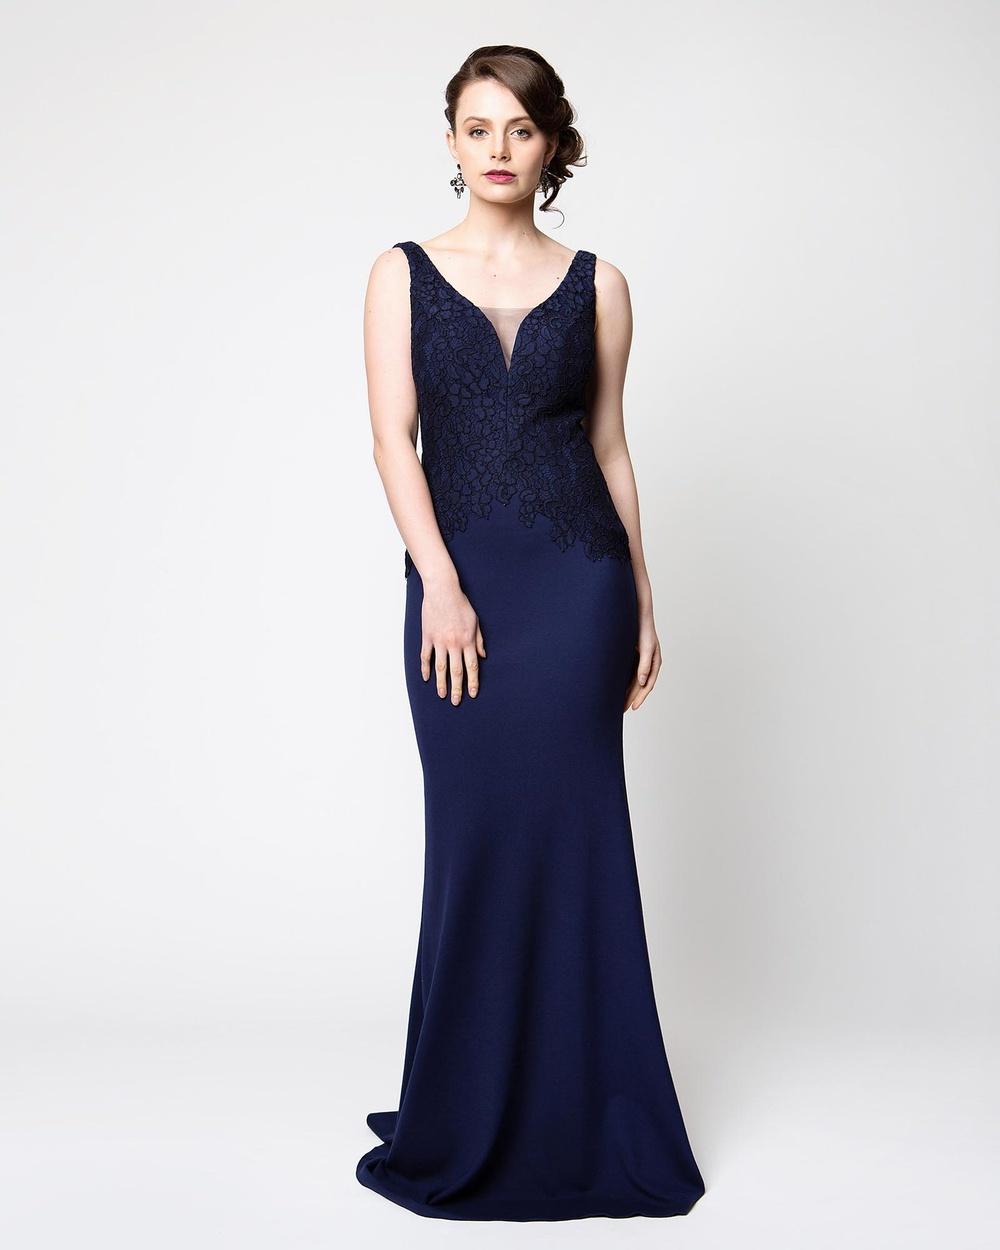 Tania Olsen Designs Bronte Dress Bodycon Dresses Navy Bronte Dress